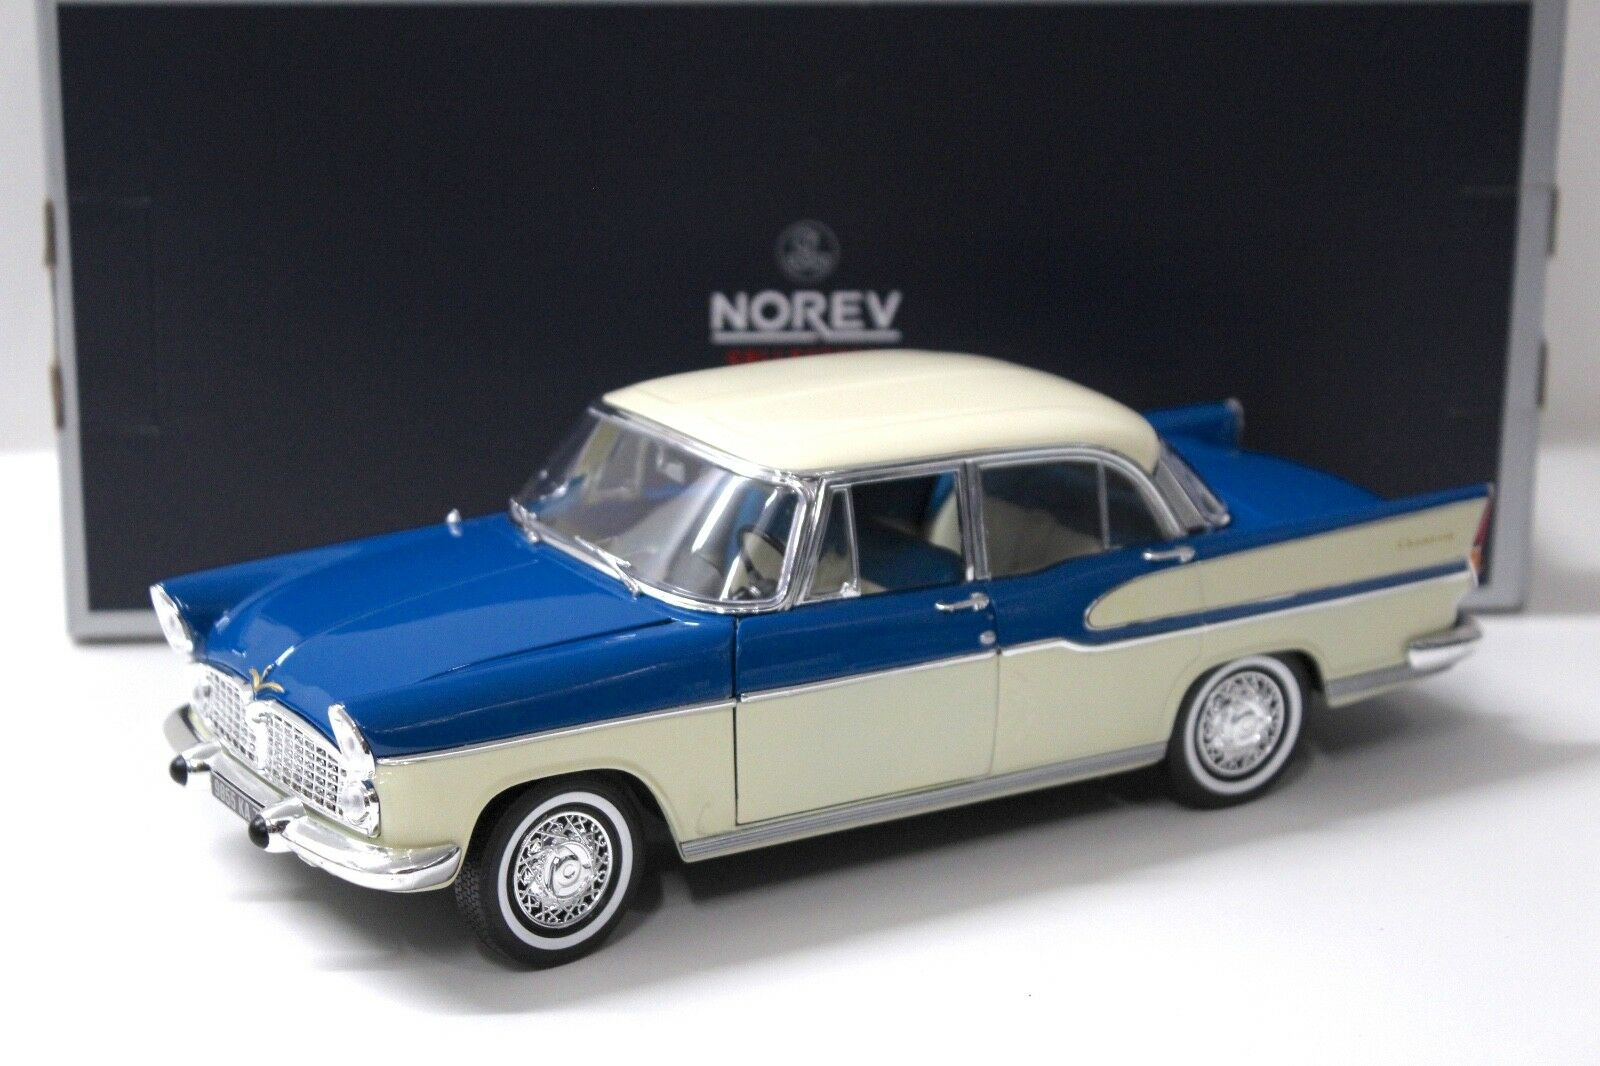 1 18 norev Simca Vedette Chambord 1960 azul beige beige beige New en Premium-modelcars 100255